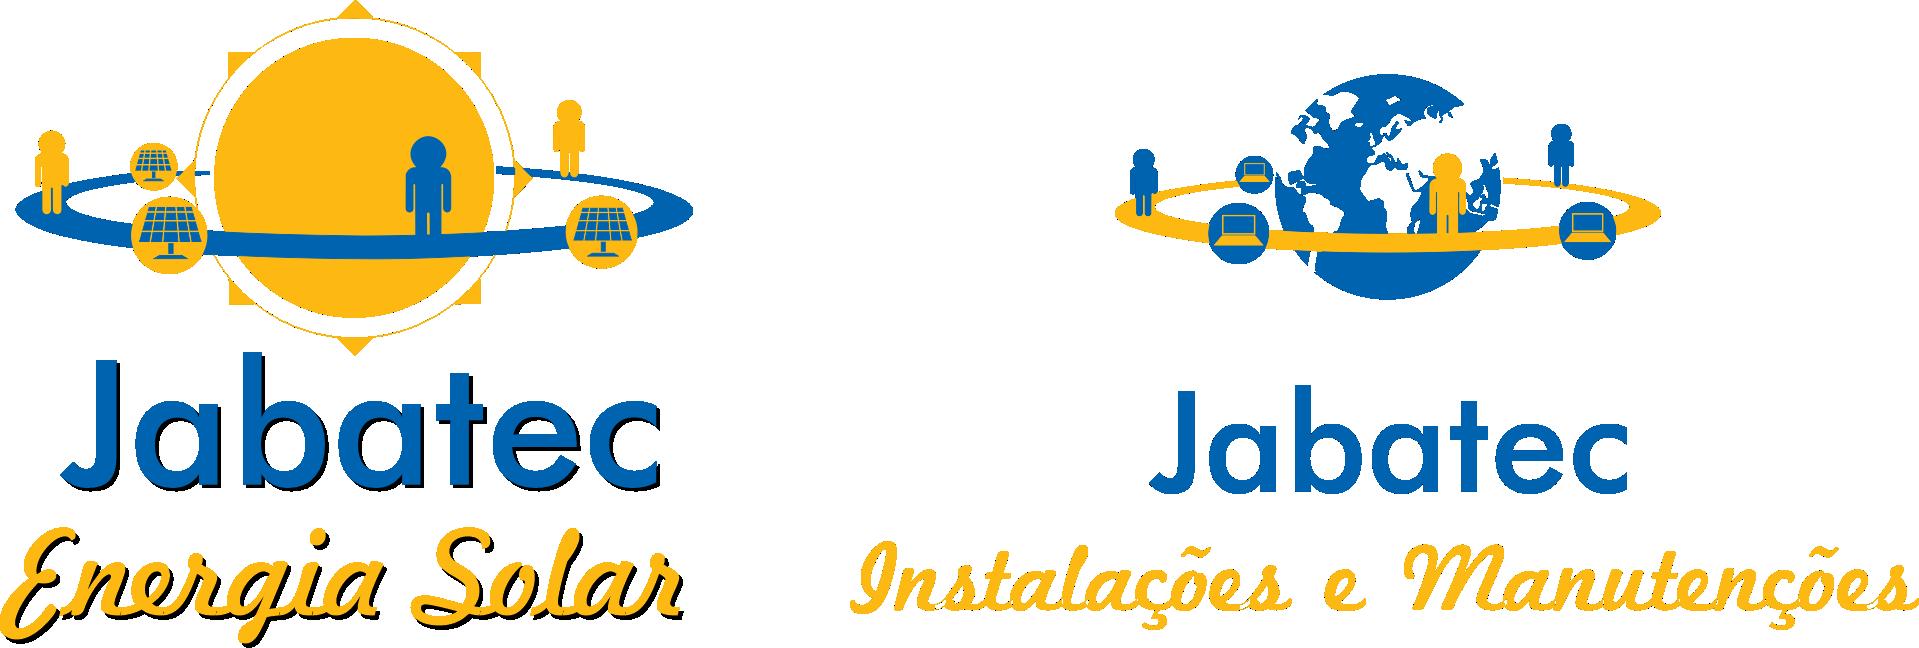 Jabatec